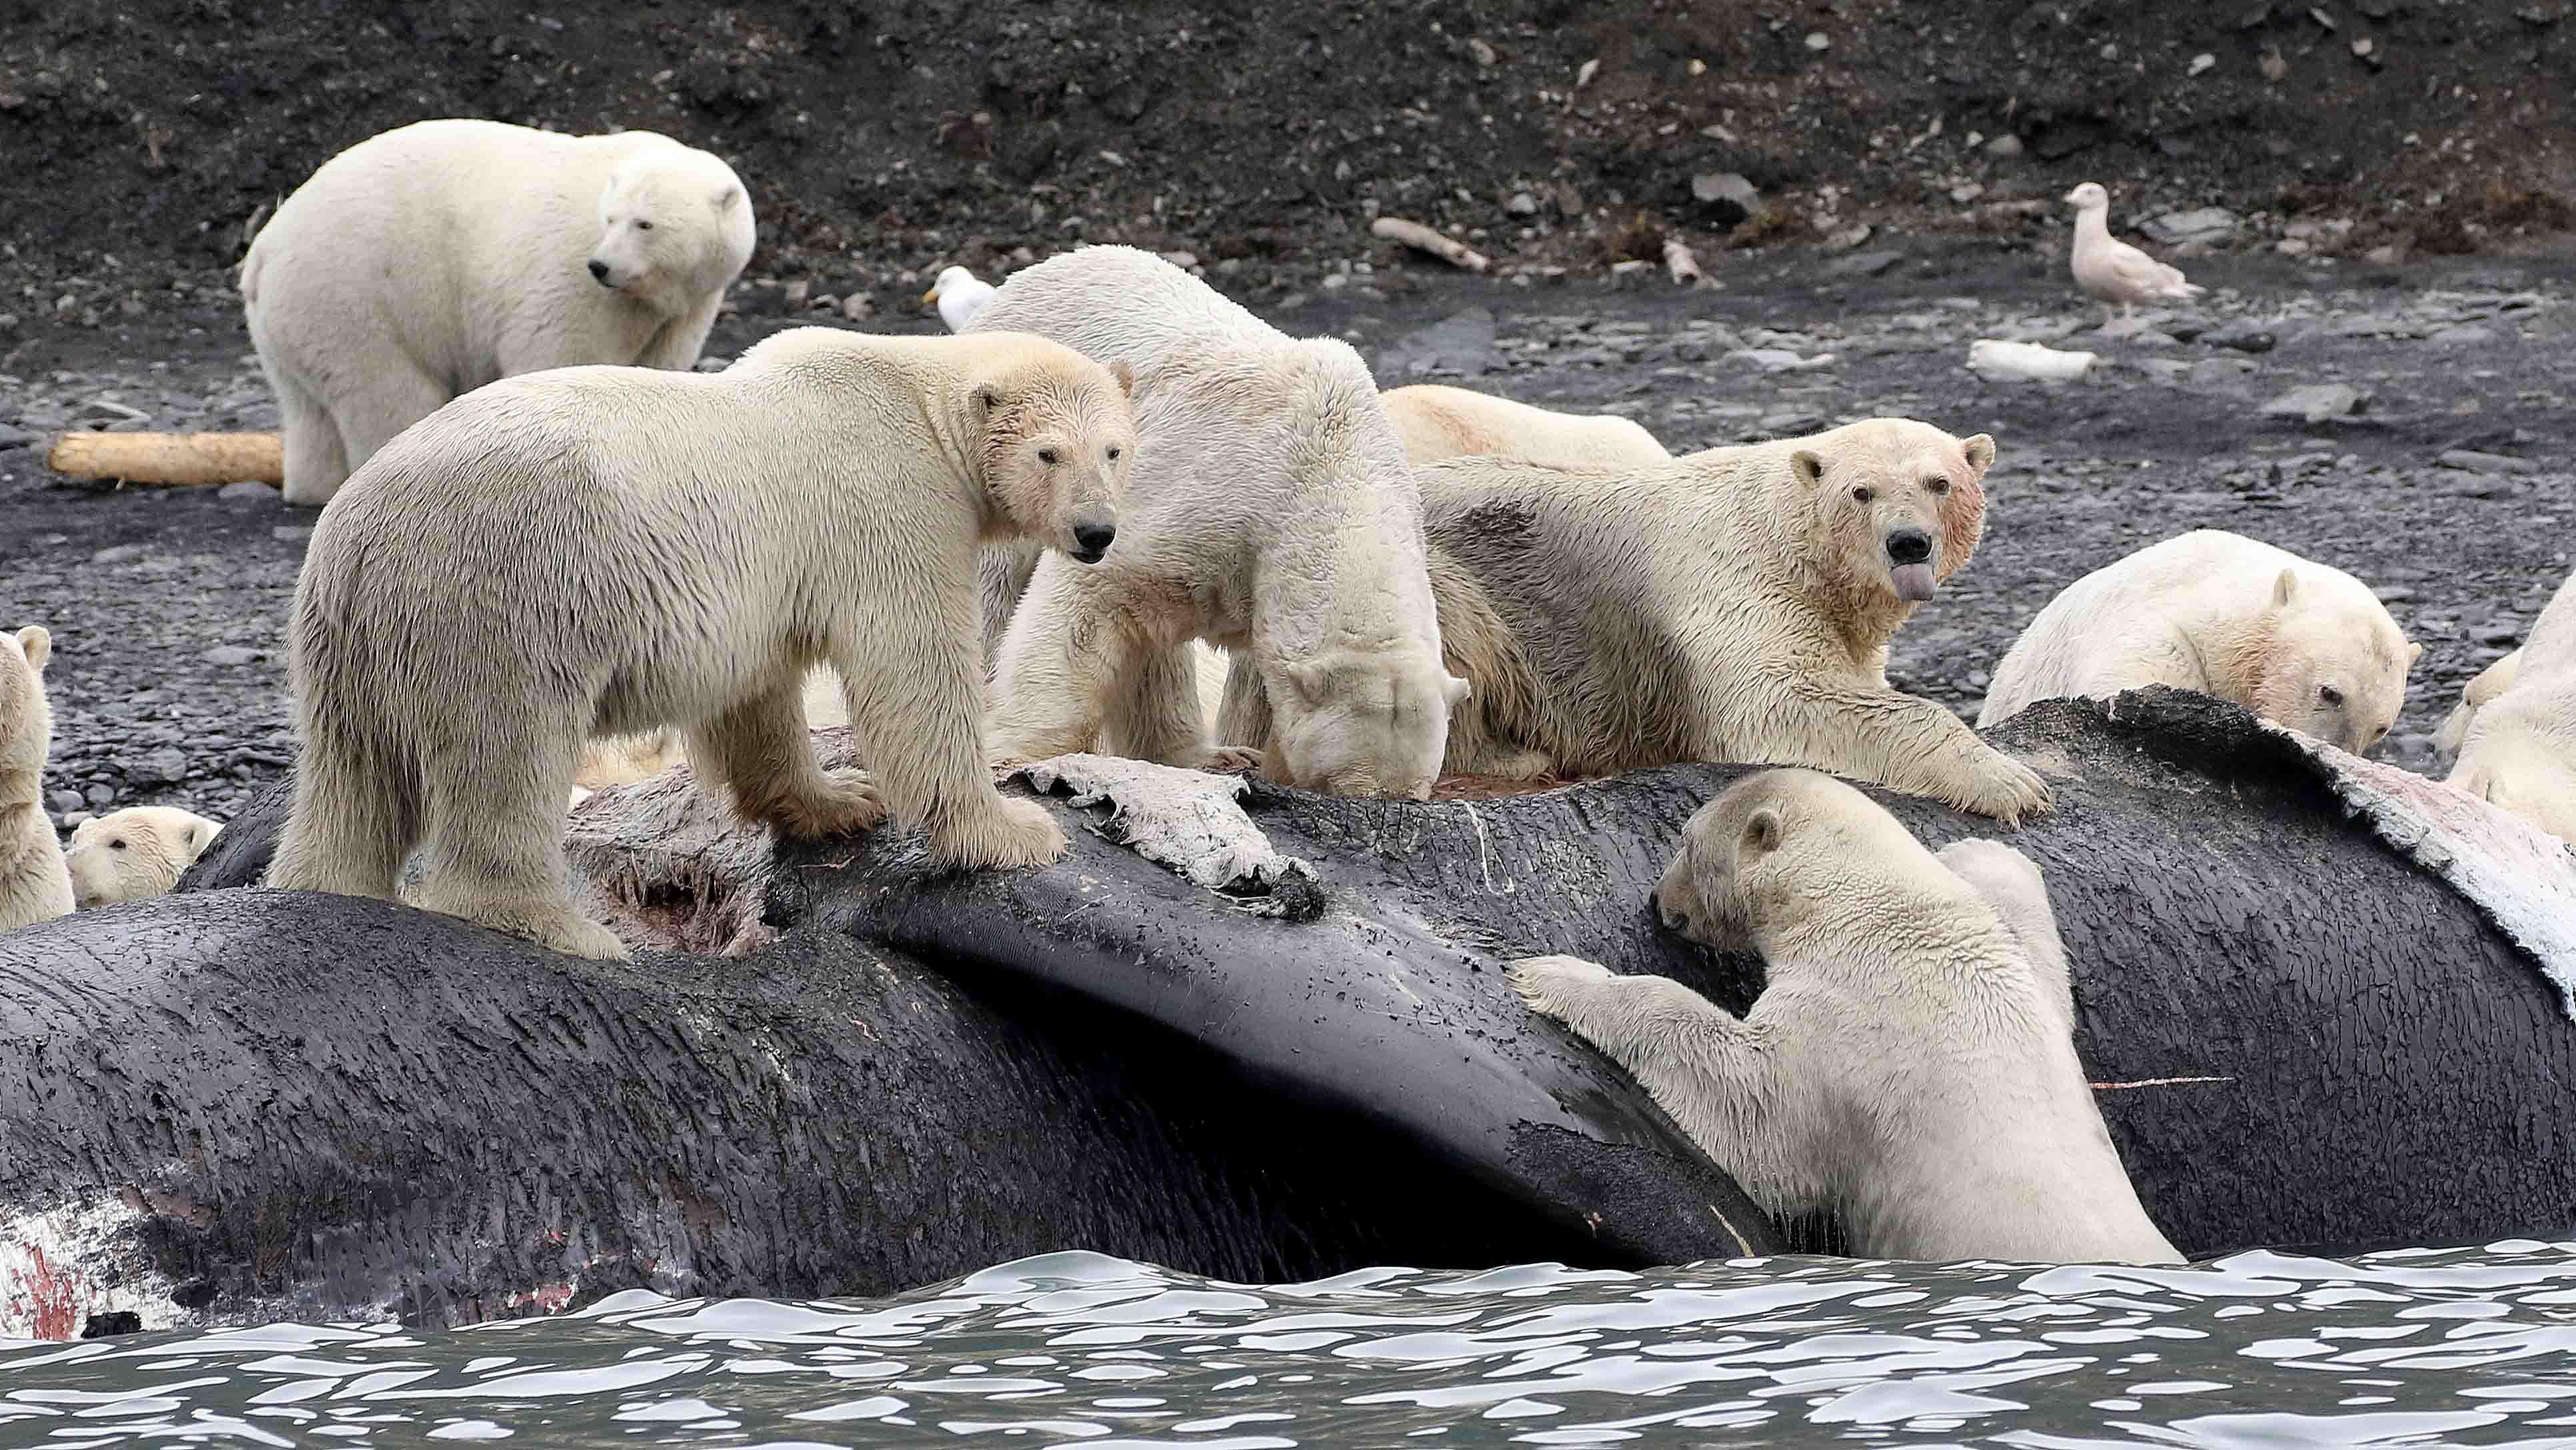 LaidreFEE_Wrangel Island scavenging_smaller